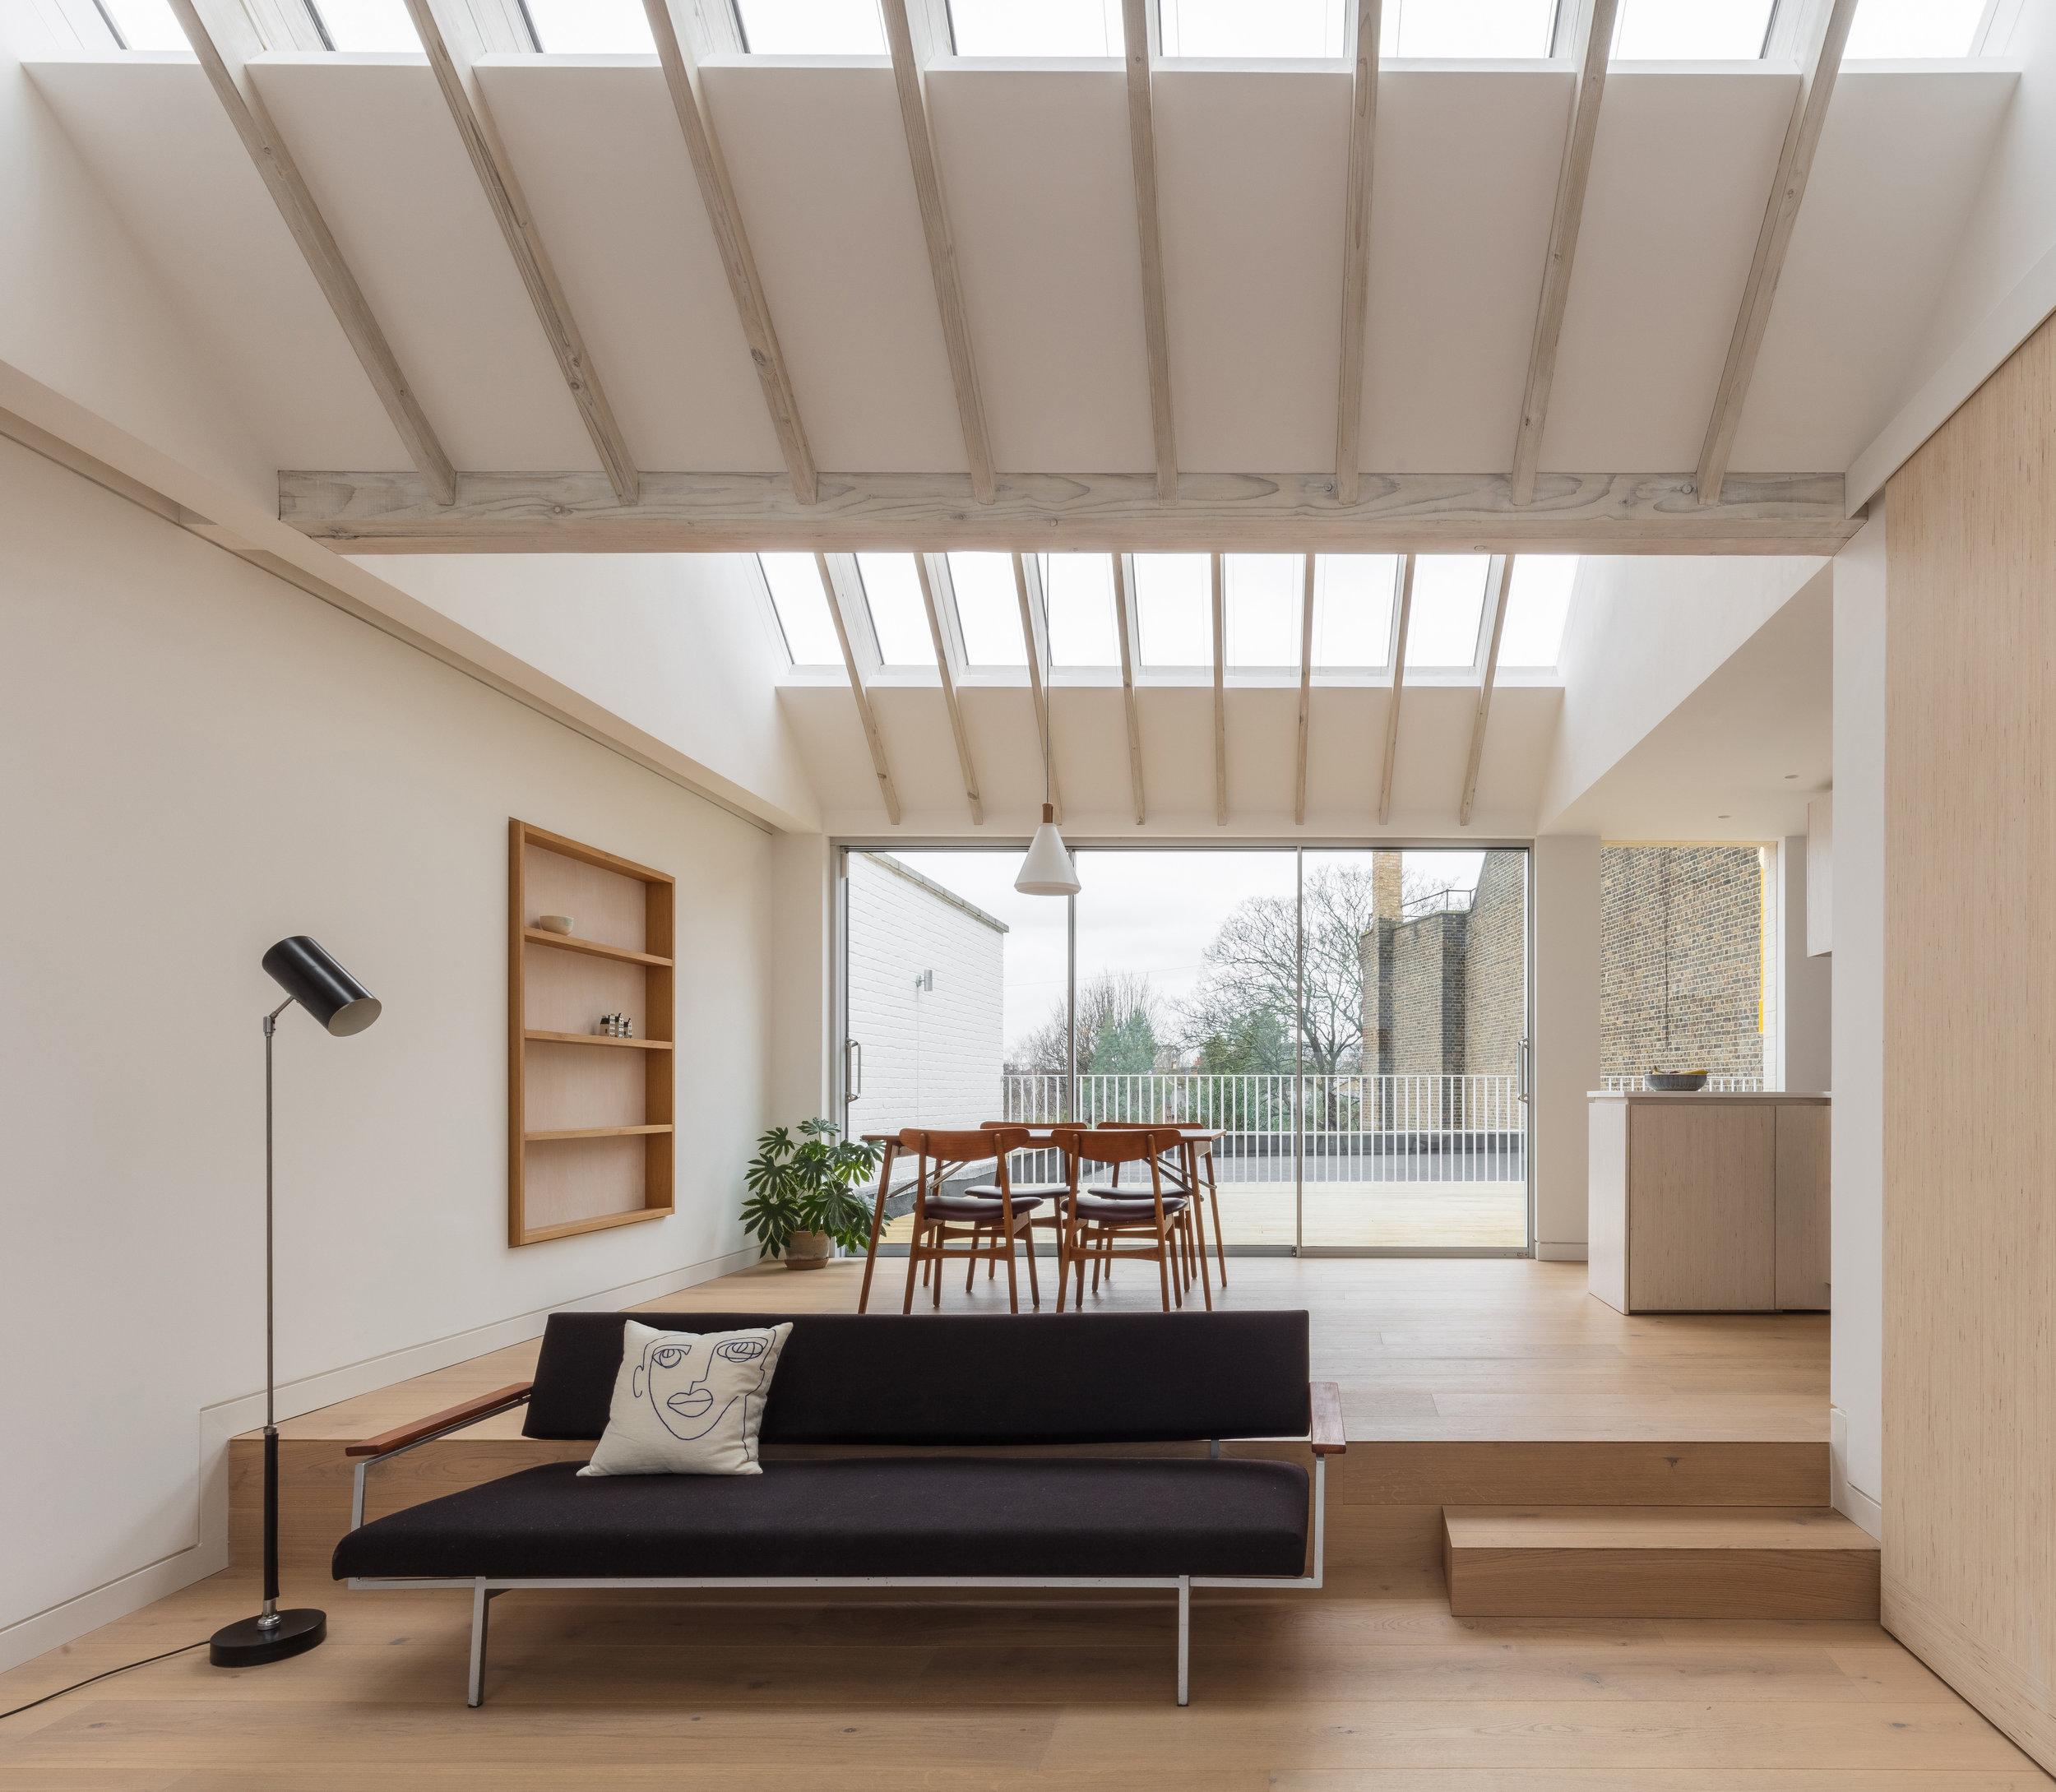 Vine Architecture Studio - Mile End Road-7 © Nicholas Worley.jpg